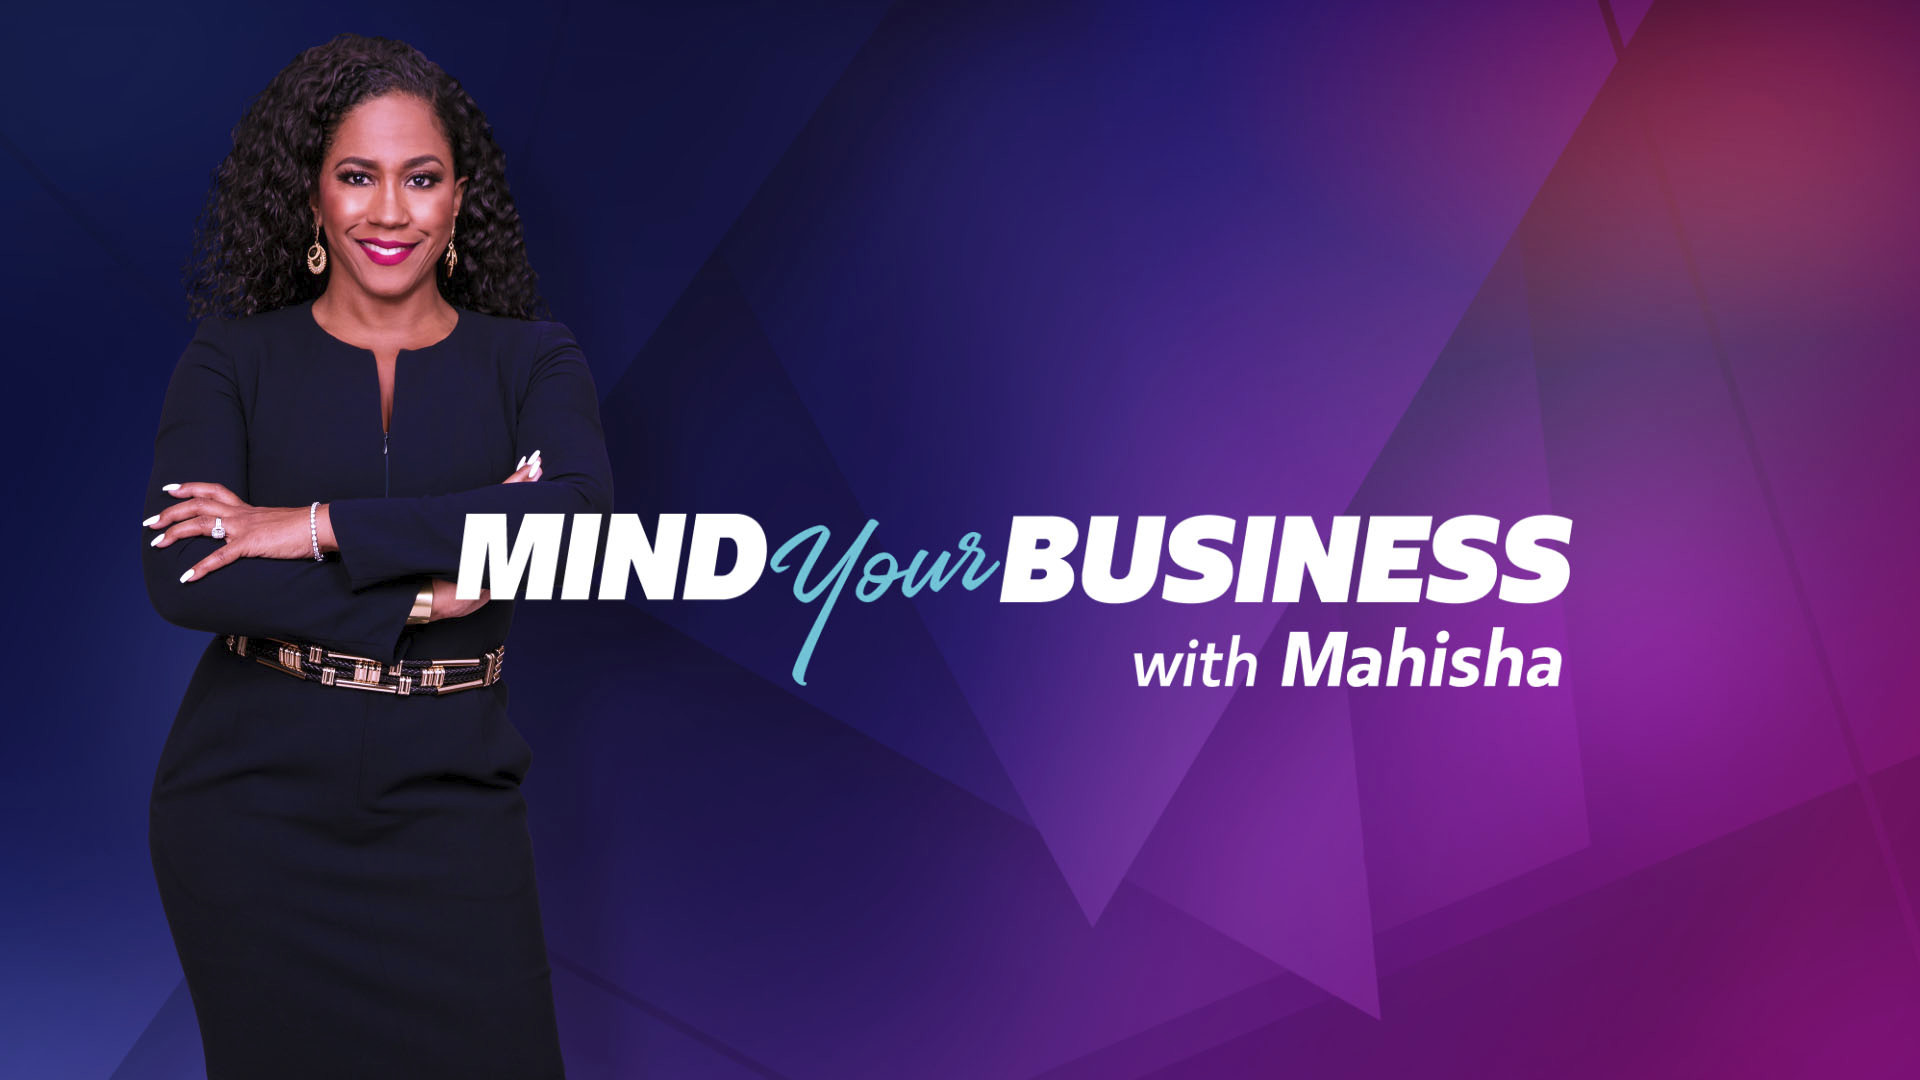 Mahisha Dellinger Creator of 'Curls' Says 'I Couldn't Avoid My Destiny'